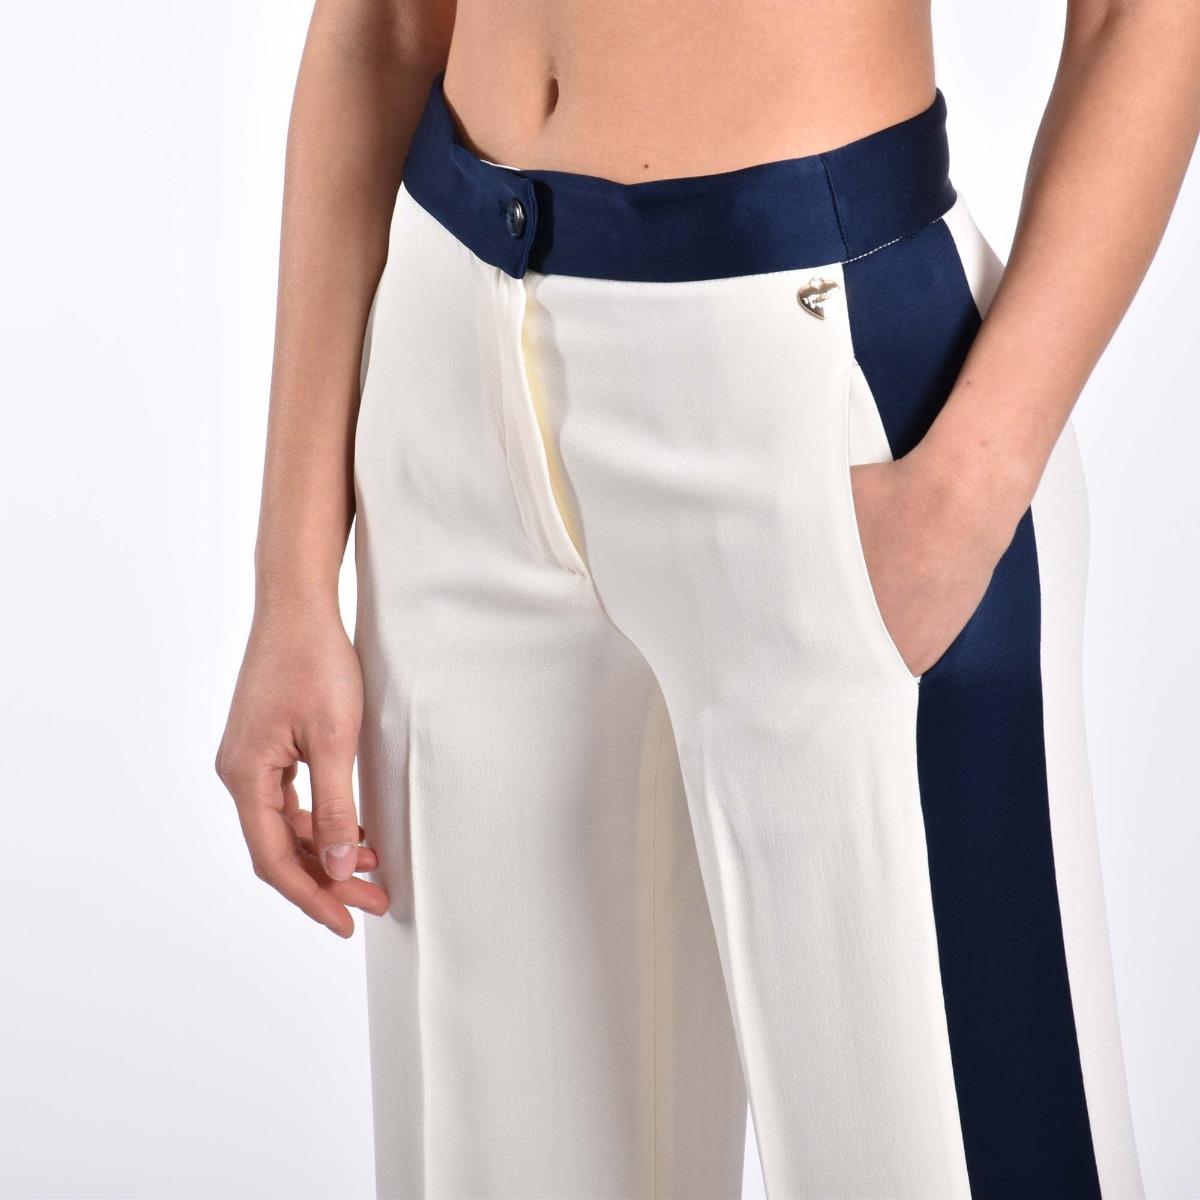 Pantalone fascia raso indaco - Bianco neve